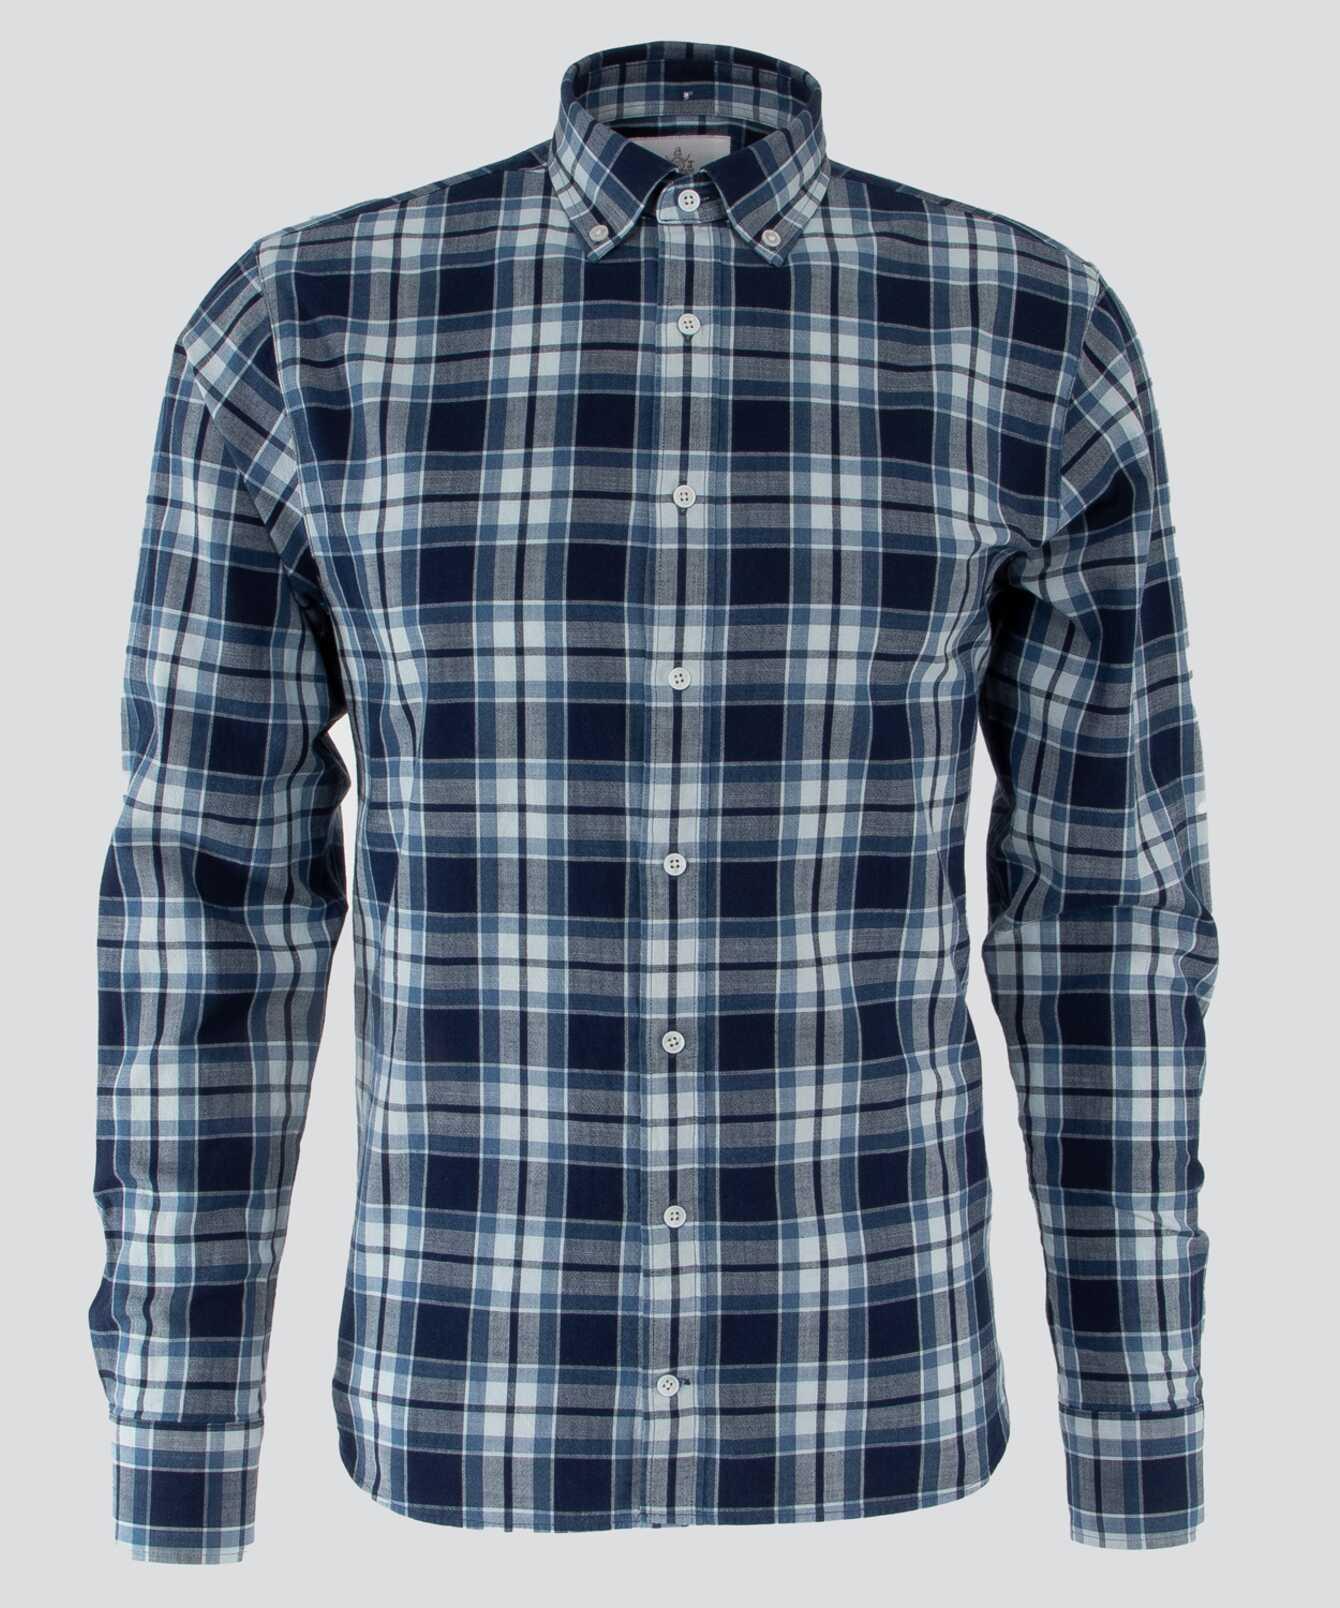 Shirt Nampa The Shirt Factory